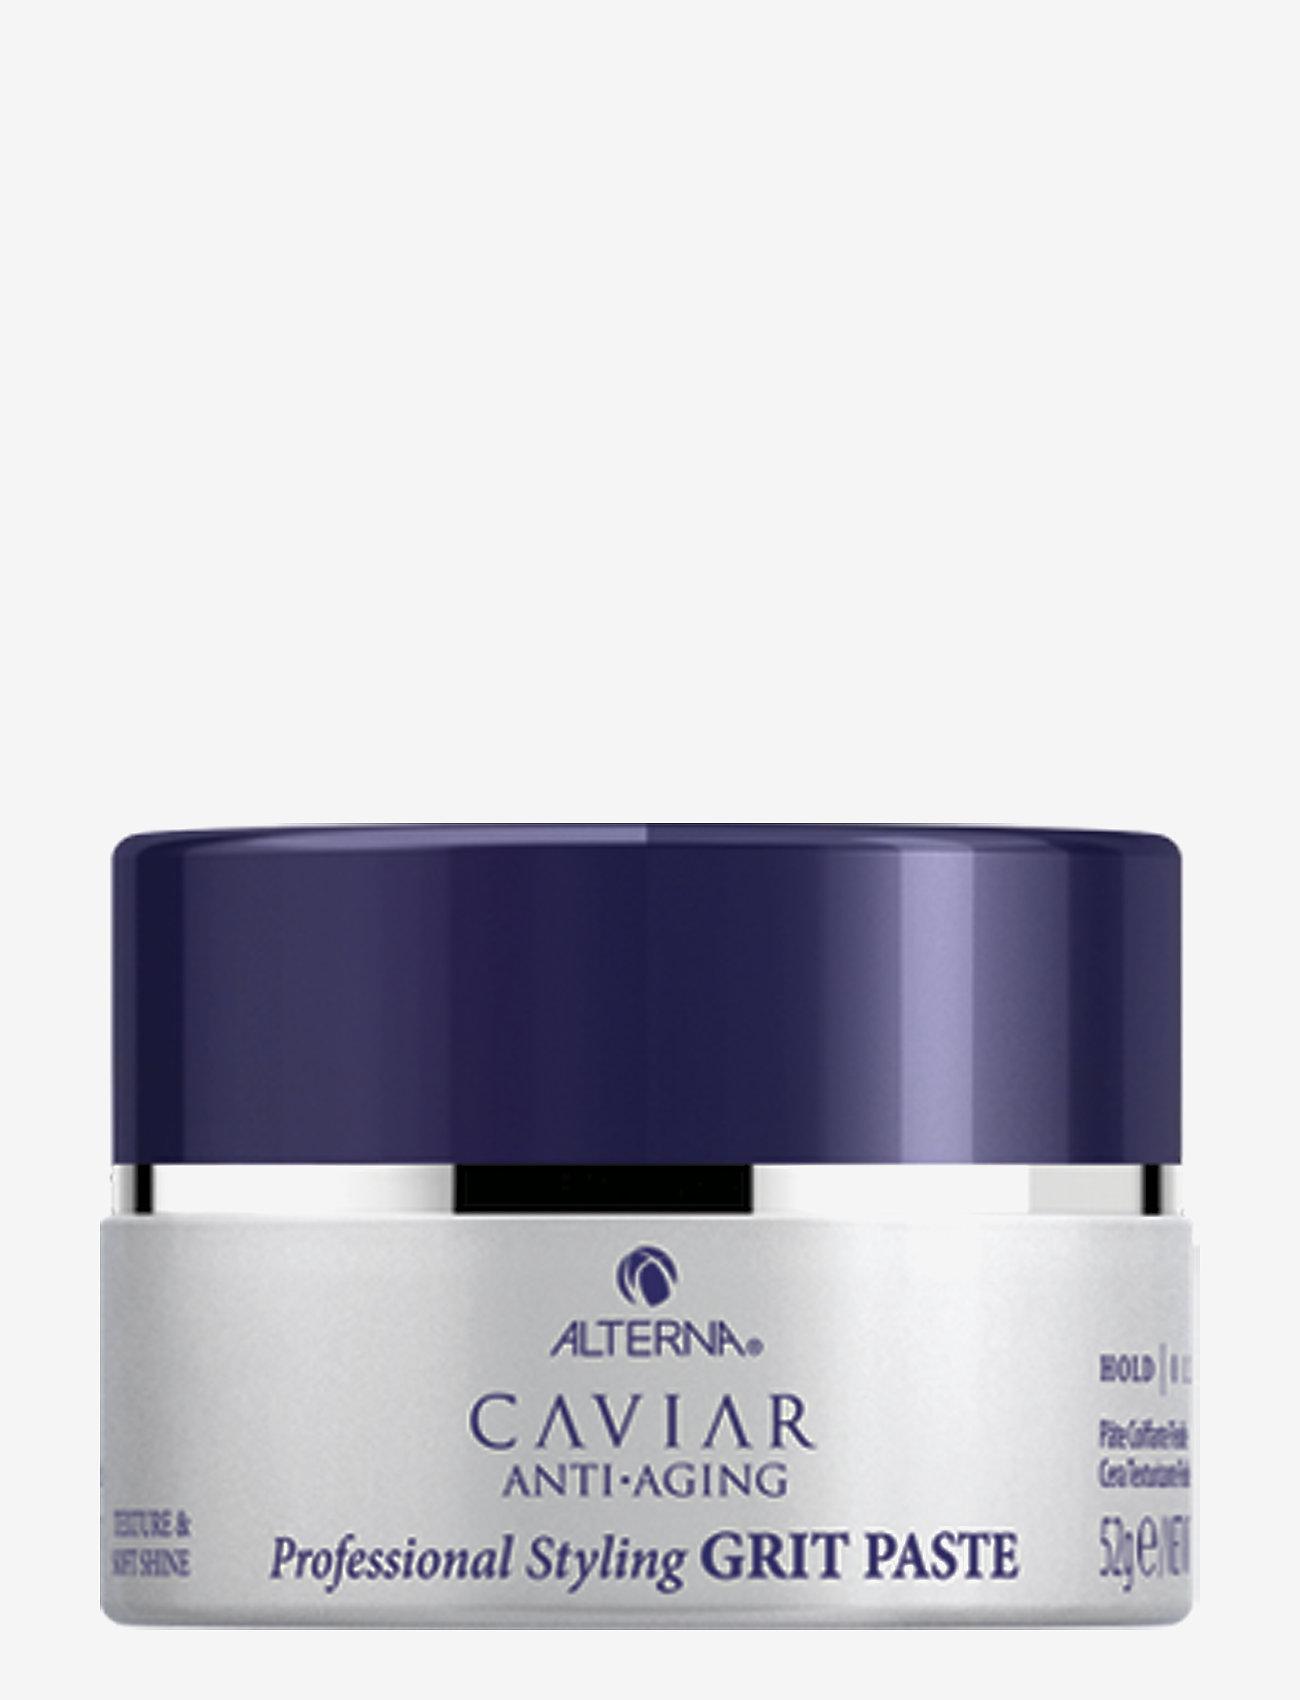 Alterna - CAVIAR ANTI-AGING STYLING GRIT PASTE - vahat & geelit - no color - 0